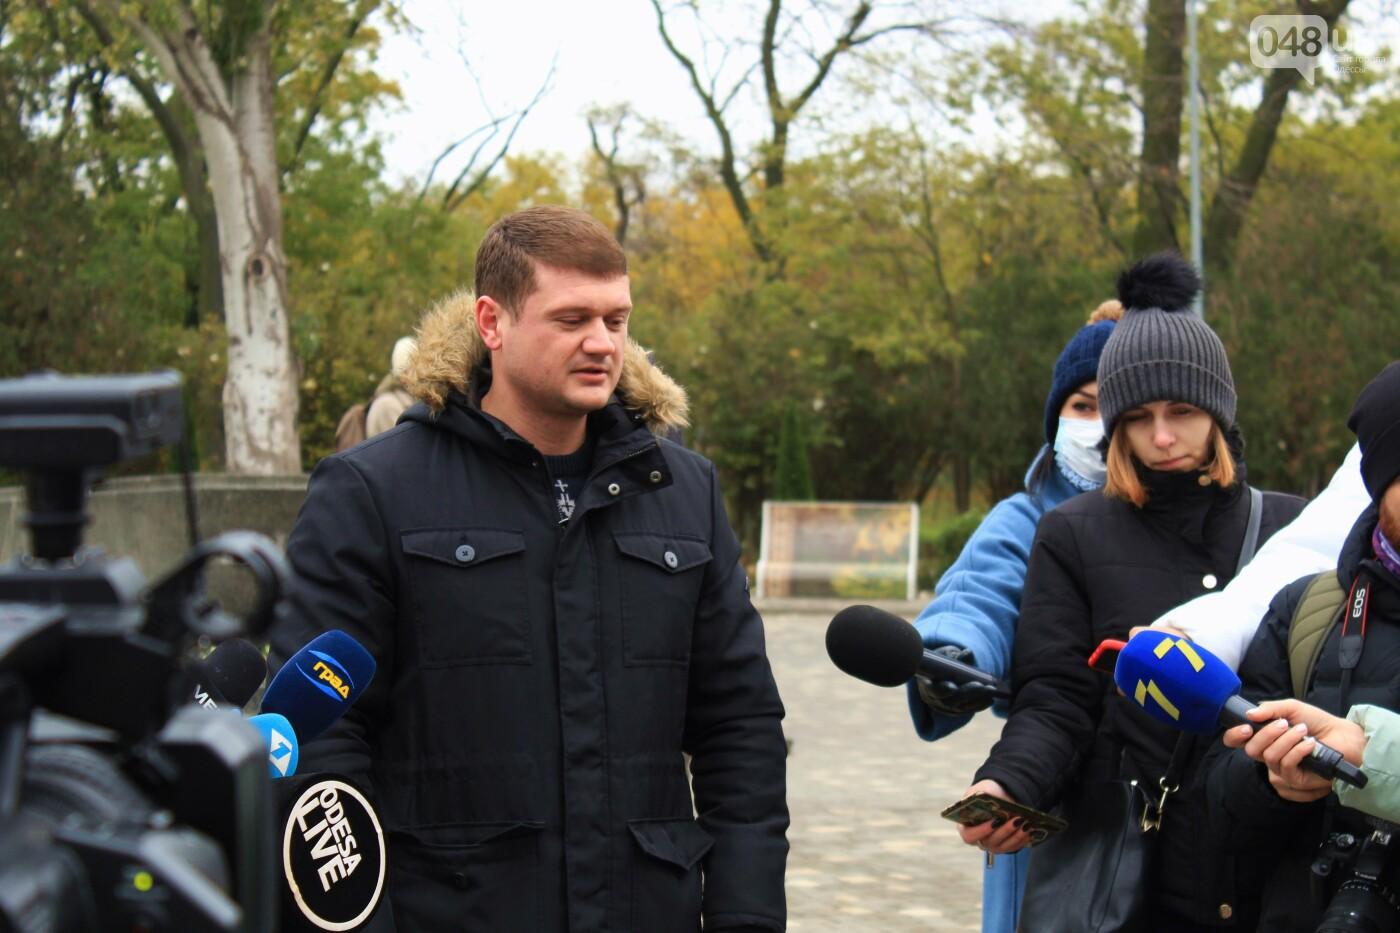 Александр Жильцов, автор: Влад Зиньковский